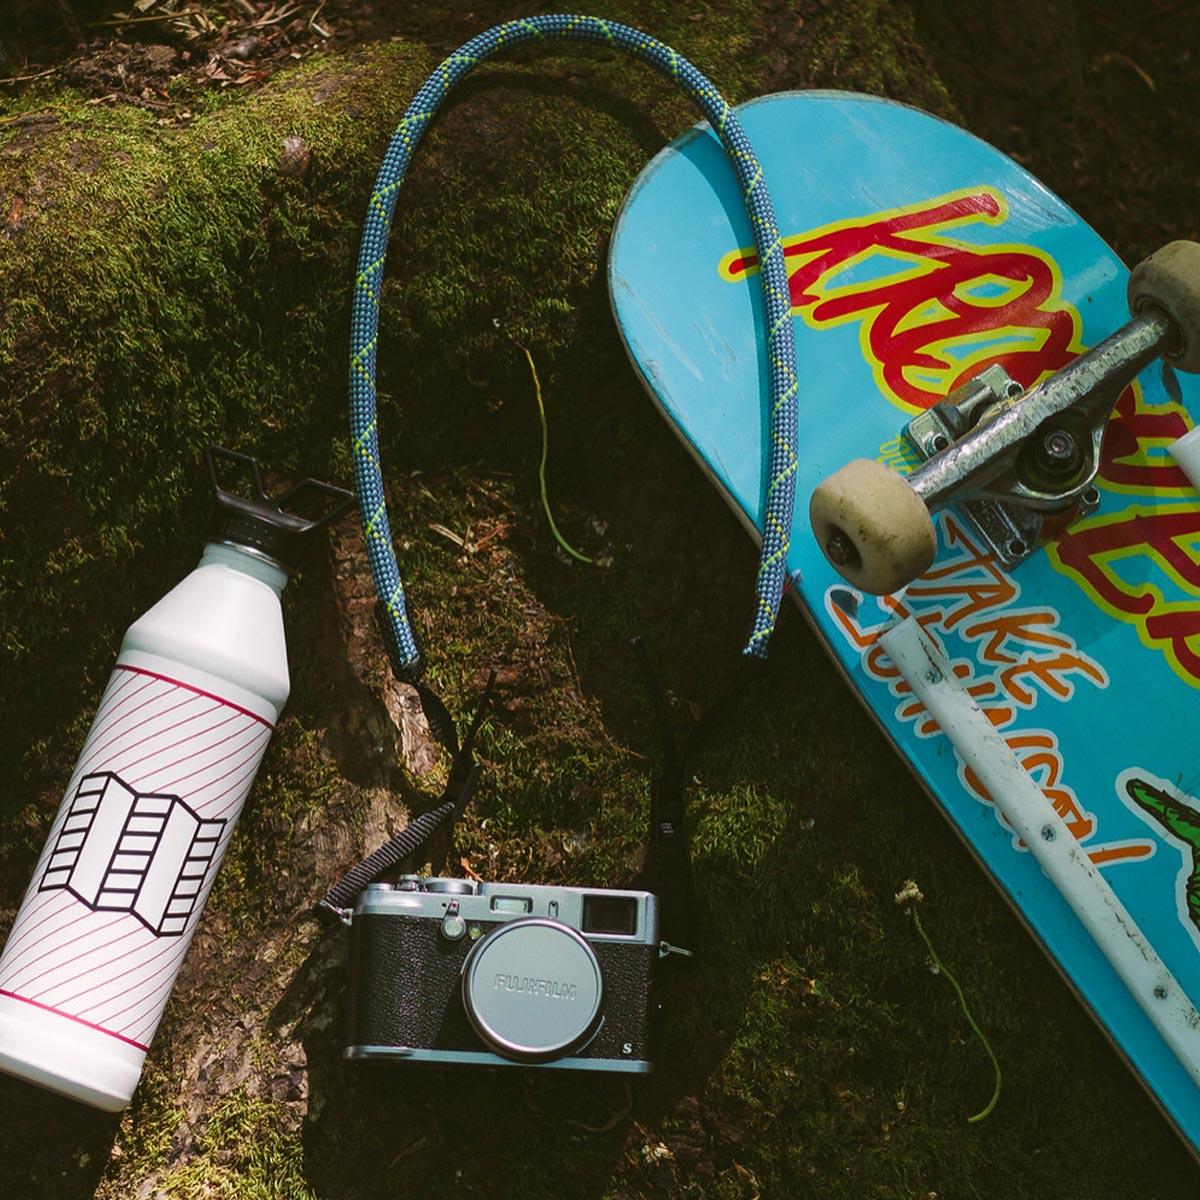 Topo Designs Camera Strap Blue, heavy-duty camera strap with outdoor style